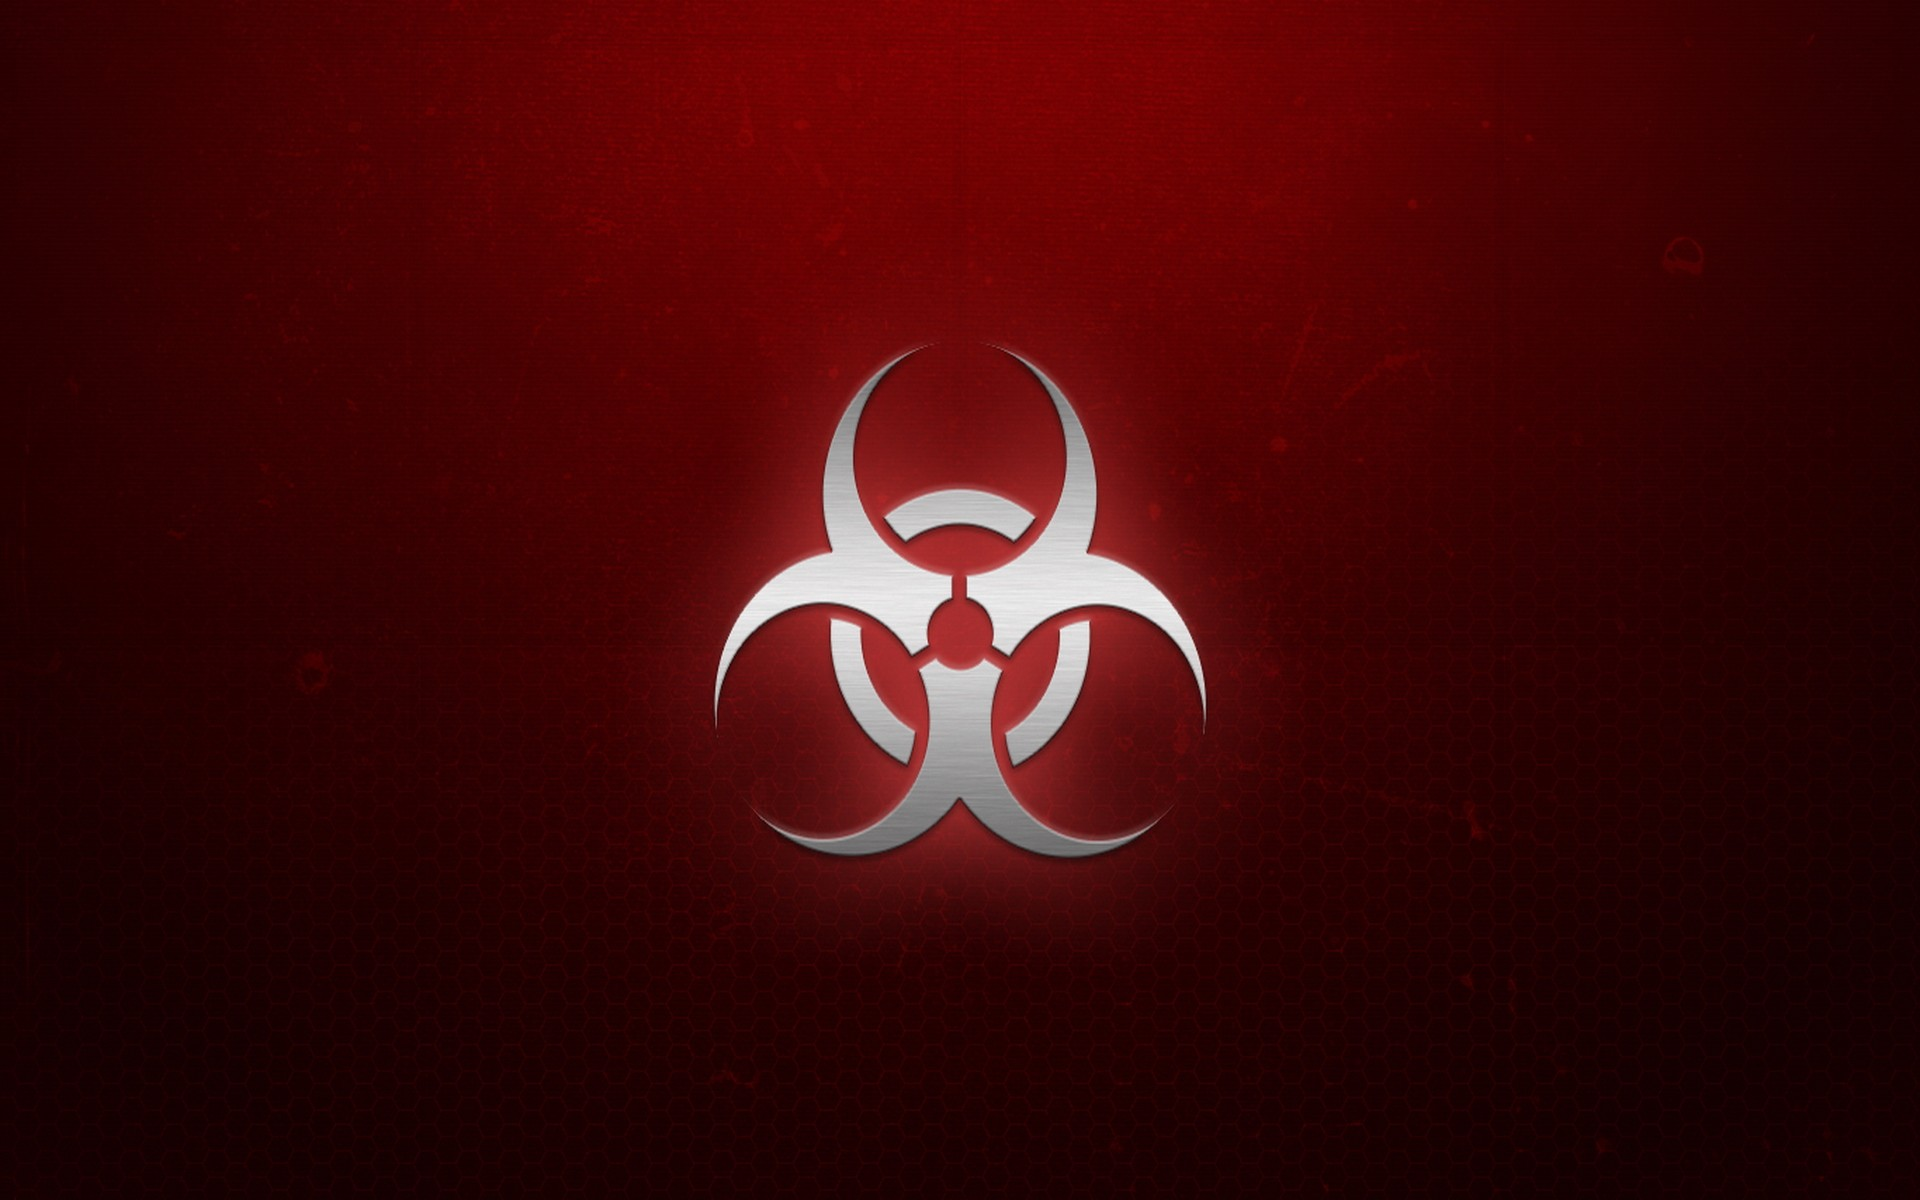 Biohazard Wallpaper Download Free Beautiful Wallpapers For